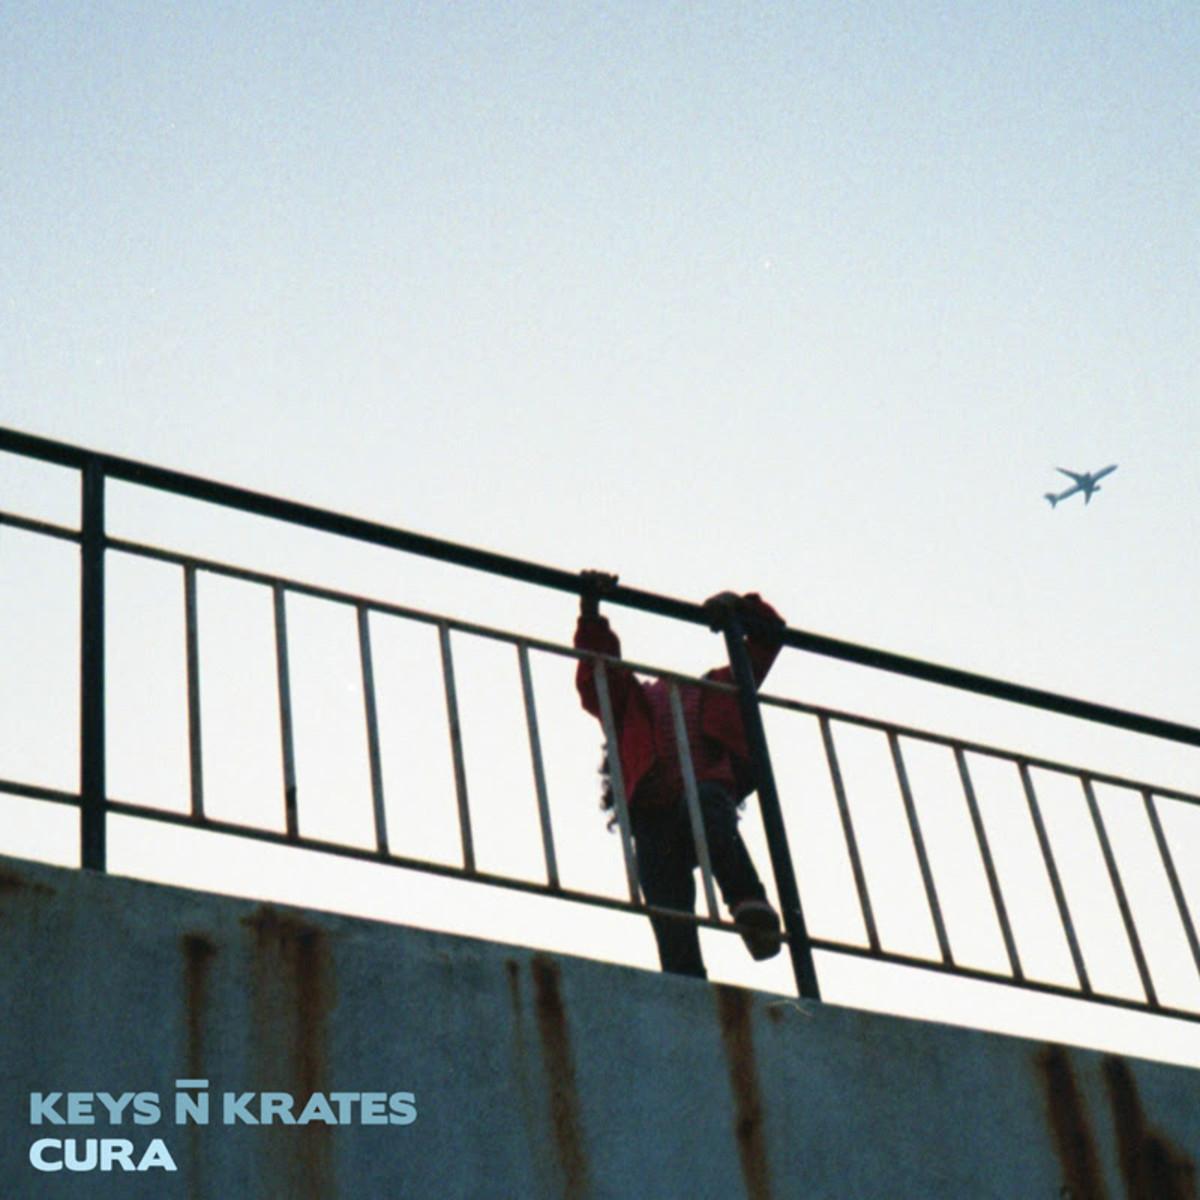 Keys N KratesCura(Dim Mak Records)